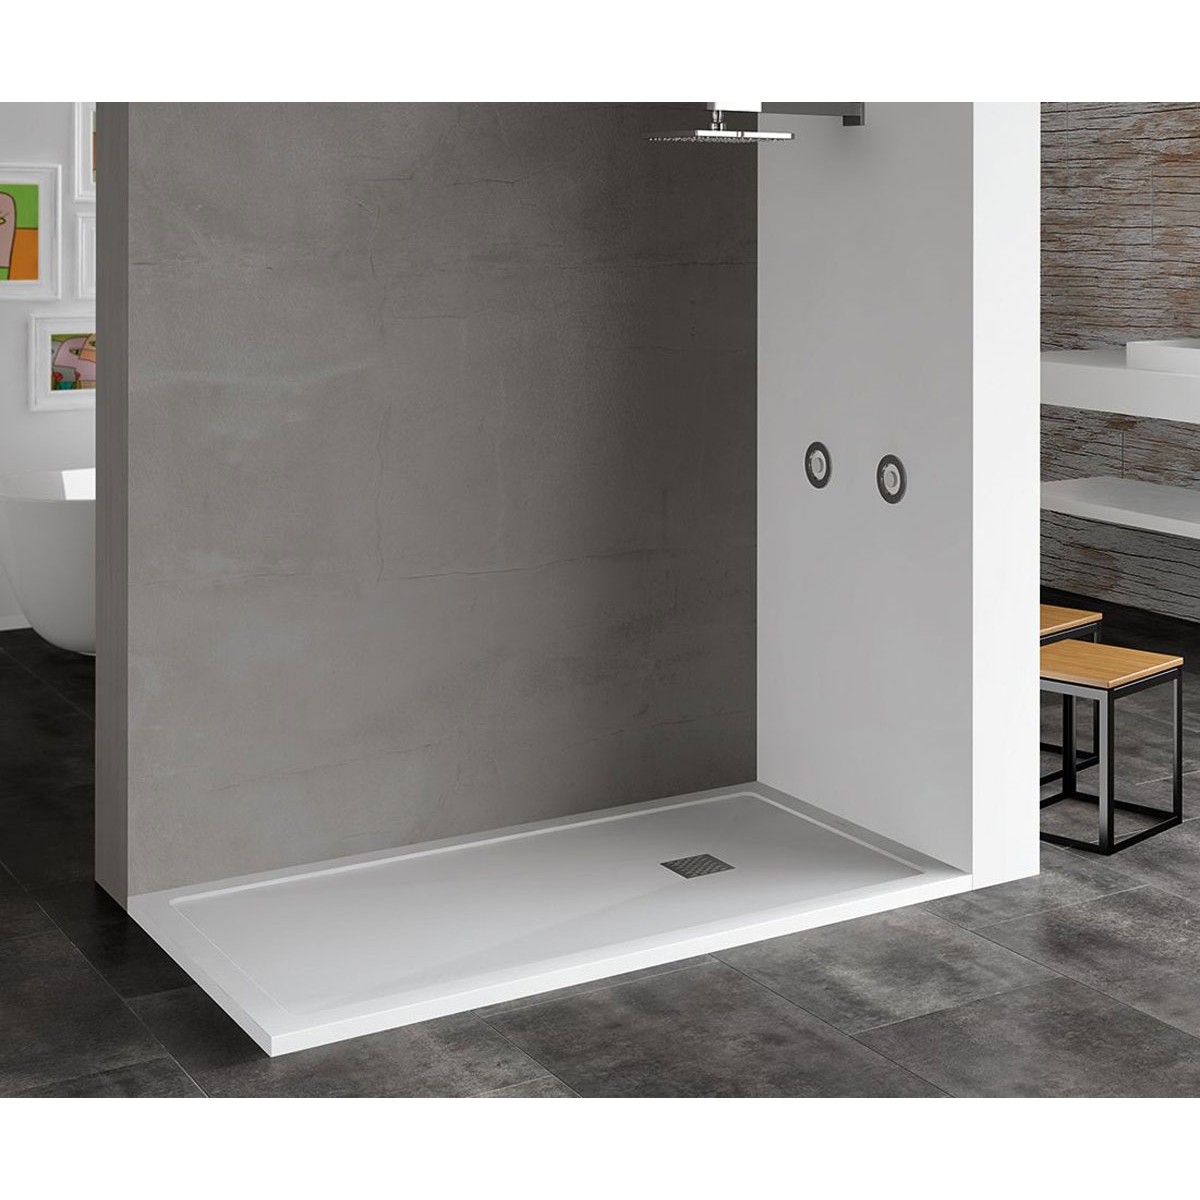 Plato de ducha rectangular 100x80 Ares Stone Nox Cemento